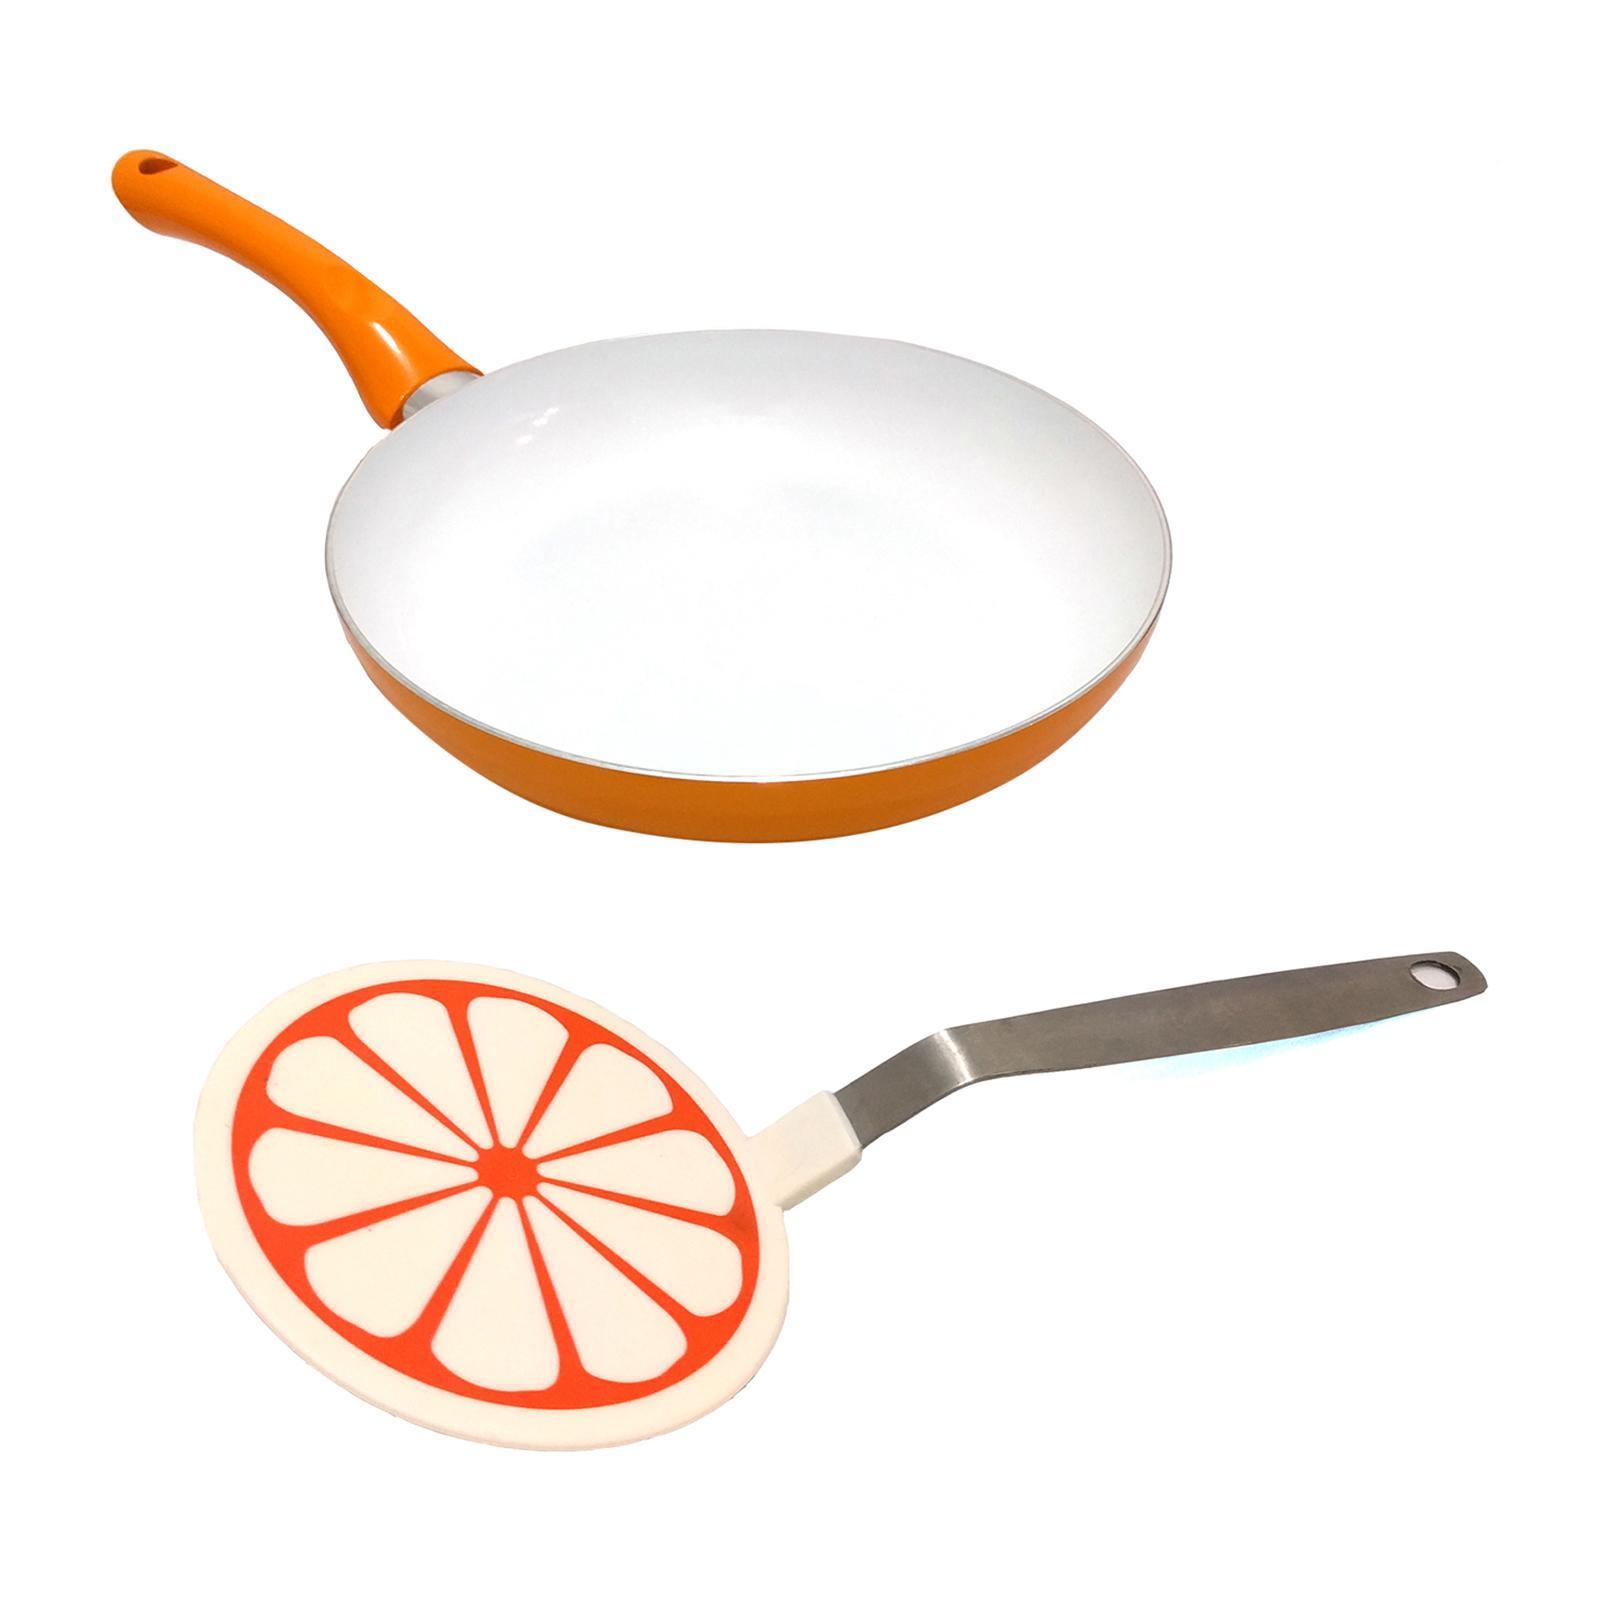 Amark Chef Delight Floral Non-Stick Ceramic Frying Pan 24cm (Orange) - Cookware